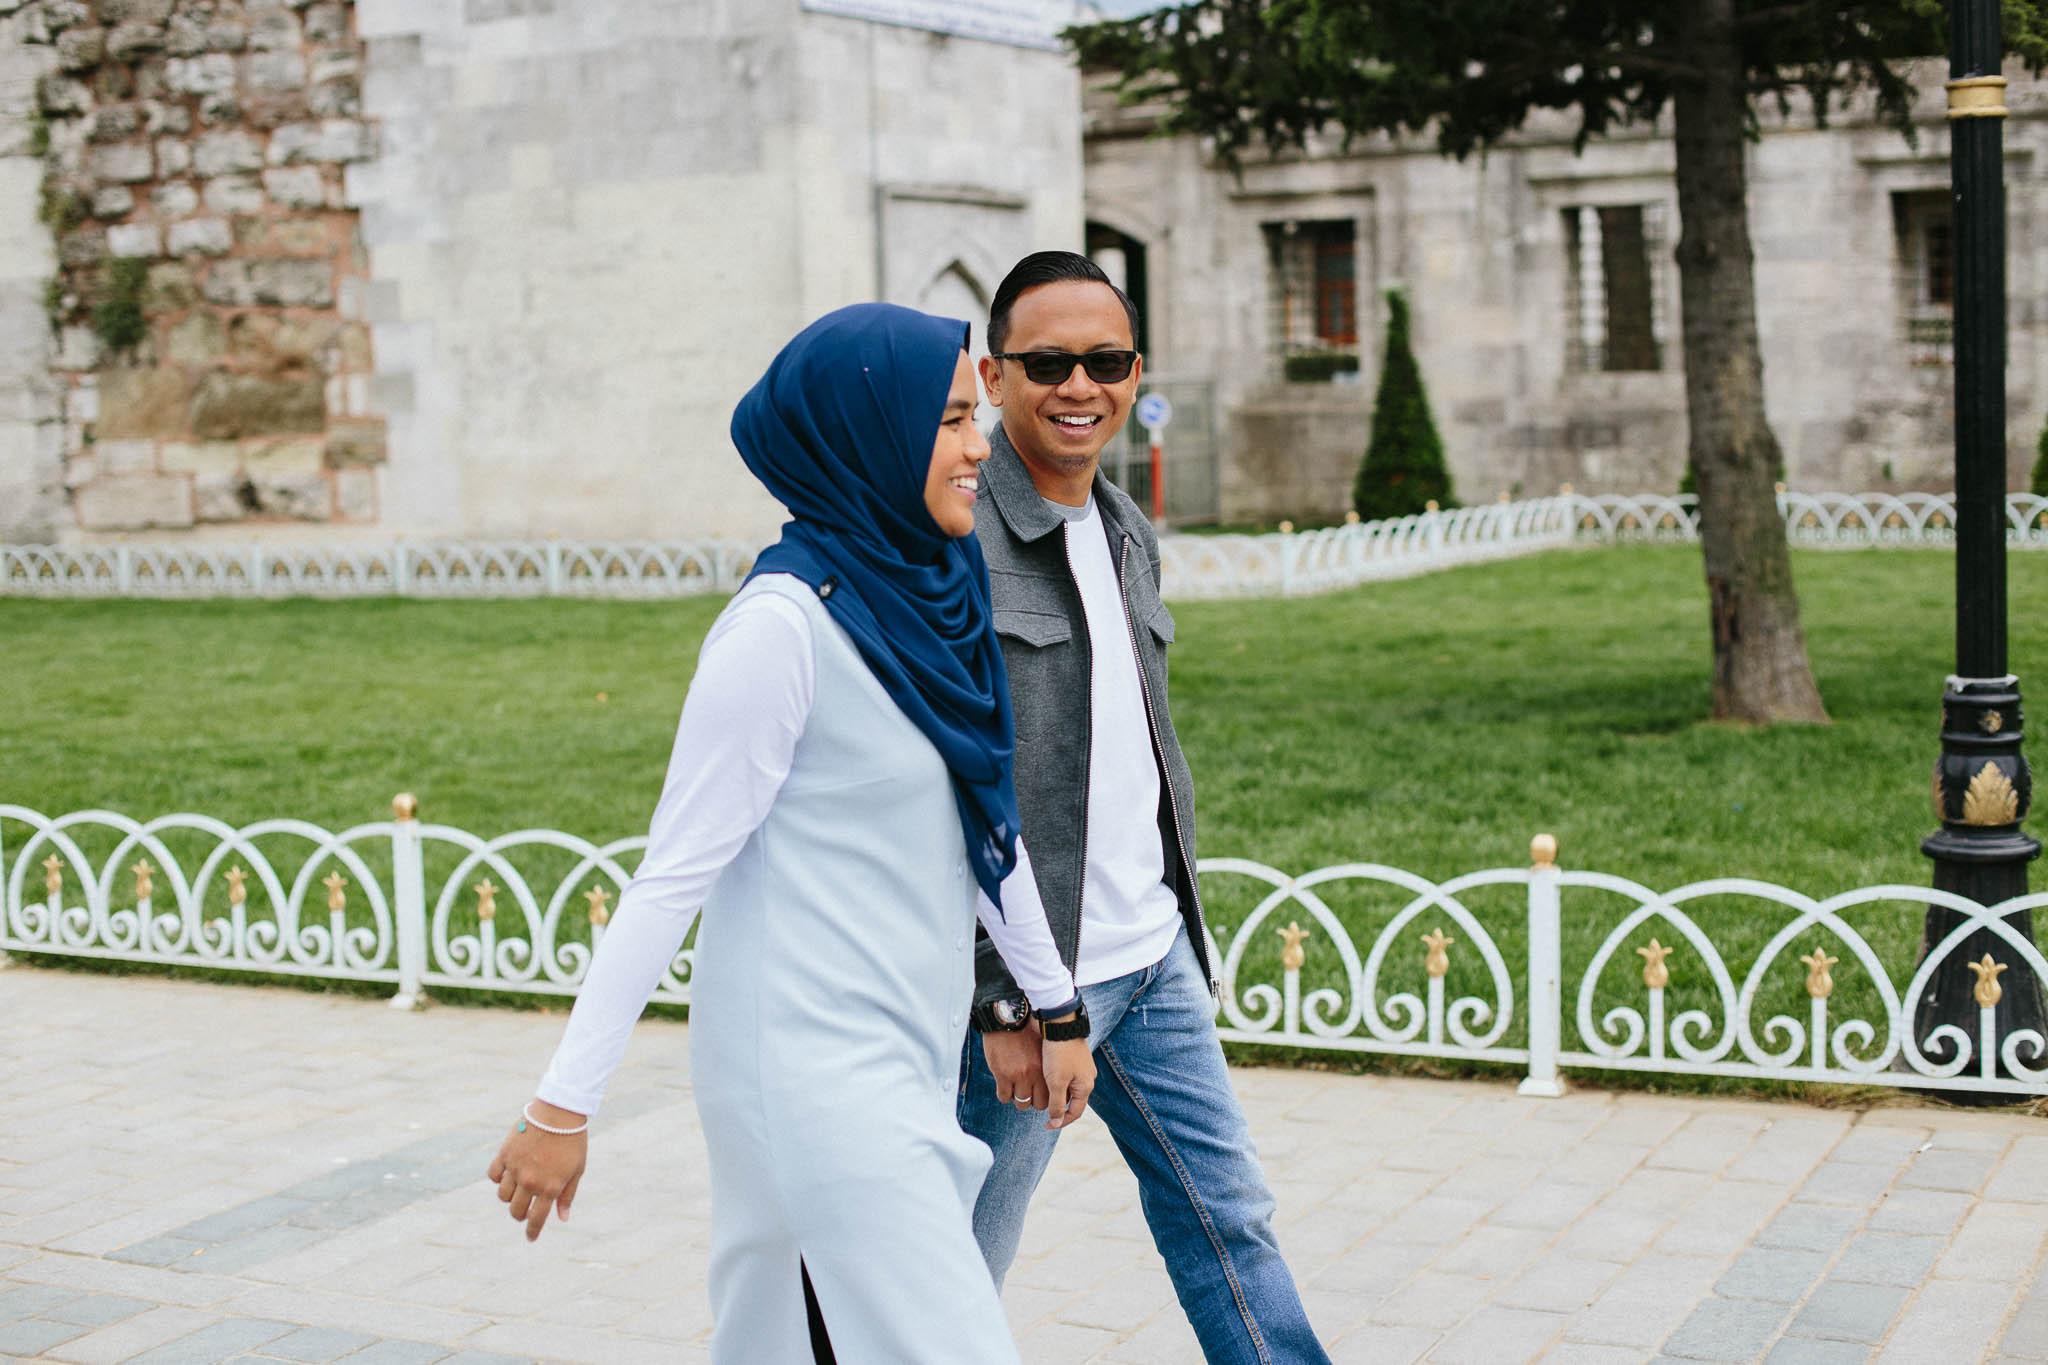 singapore-wedding-photographer-dzul-isma-istanbul-10.jpg